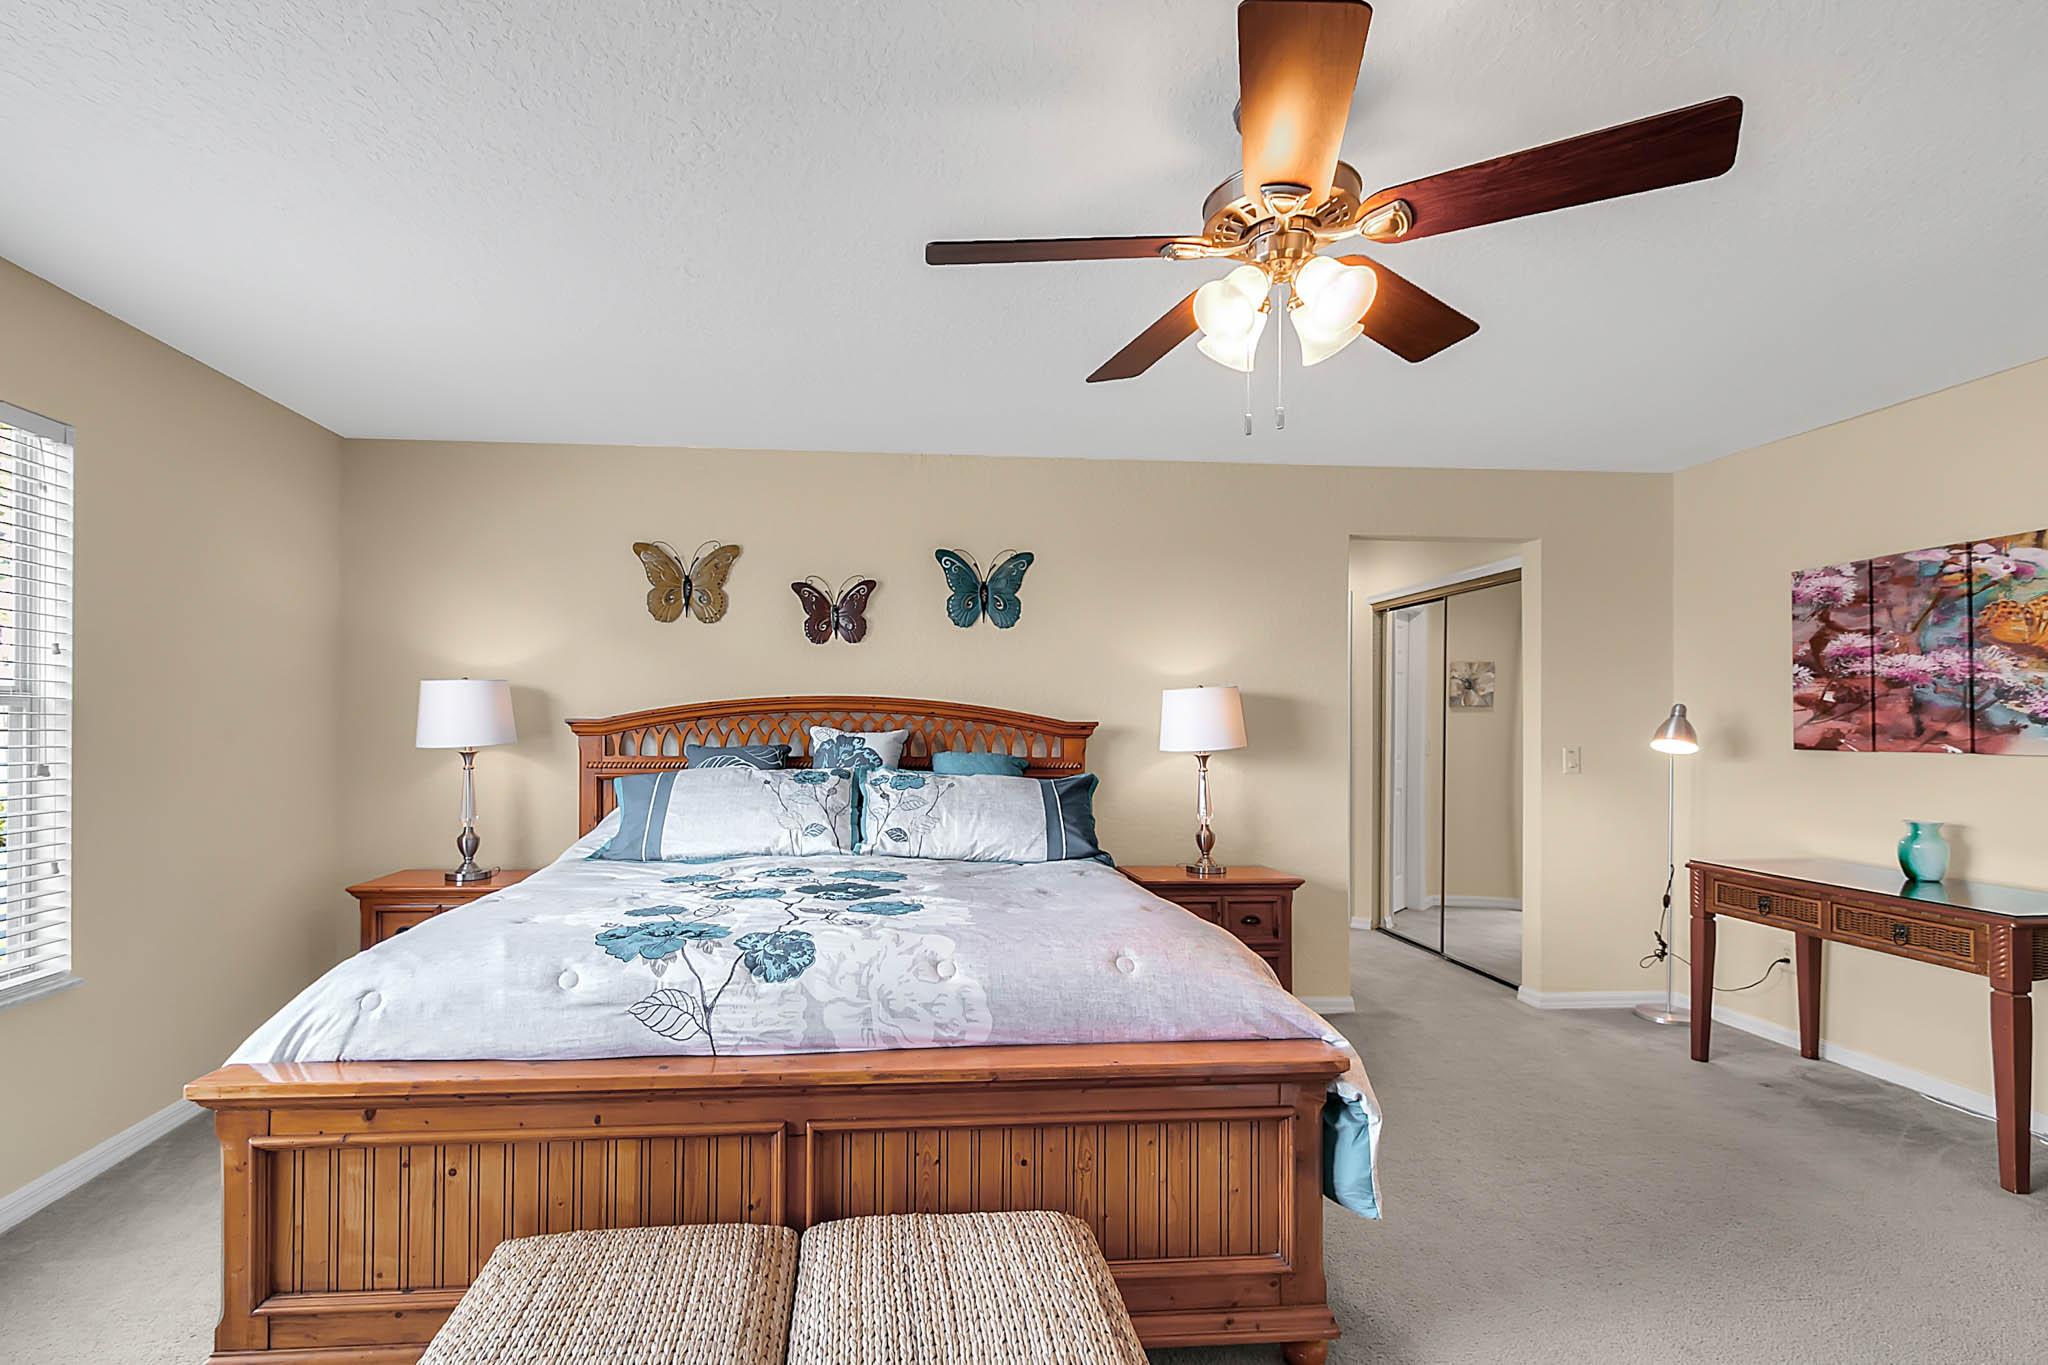 229-N-Hampton-Dr--Davenport--FL-33897----19---Master-Bedroom.jpg